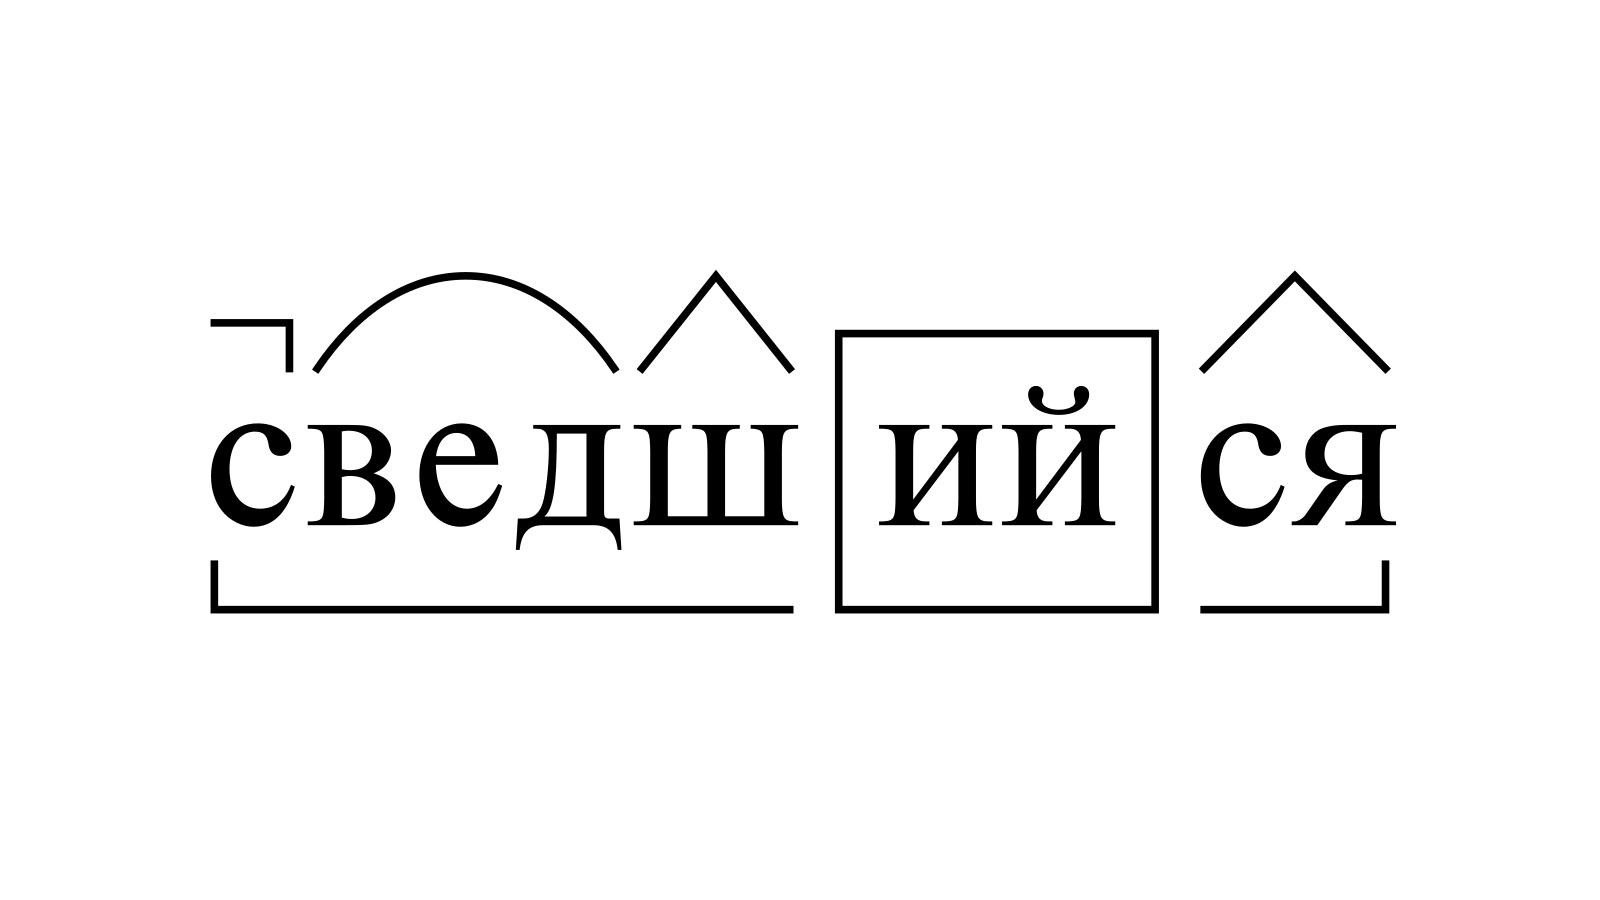 Разбор слова «сведшийся» по составу